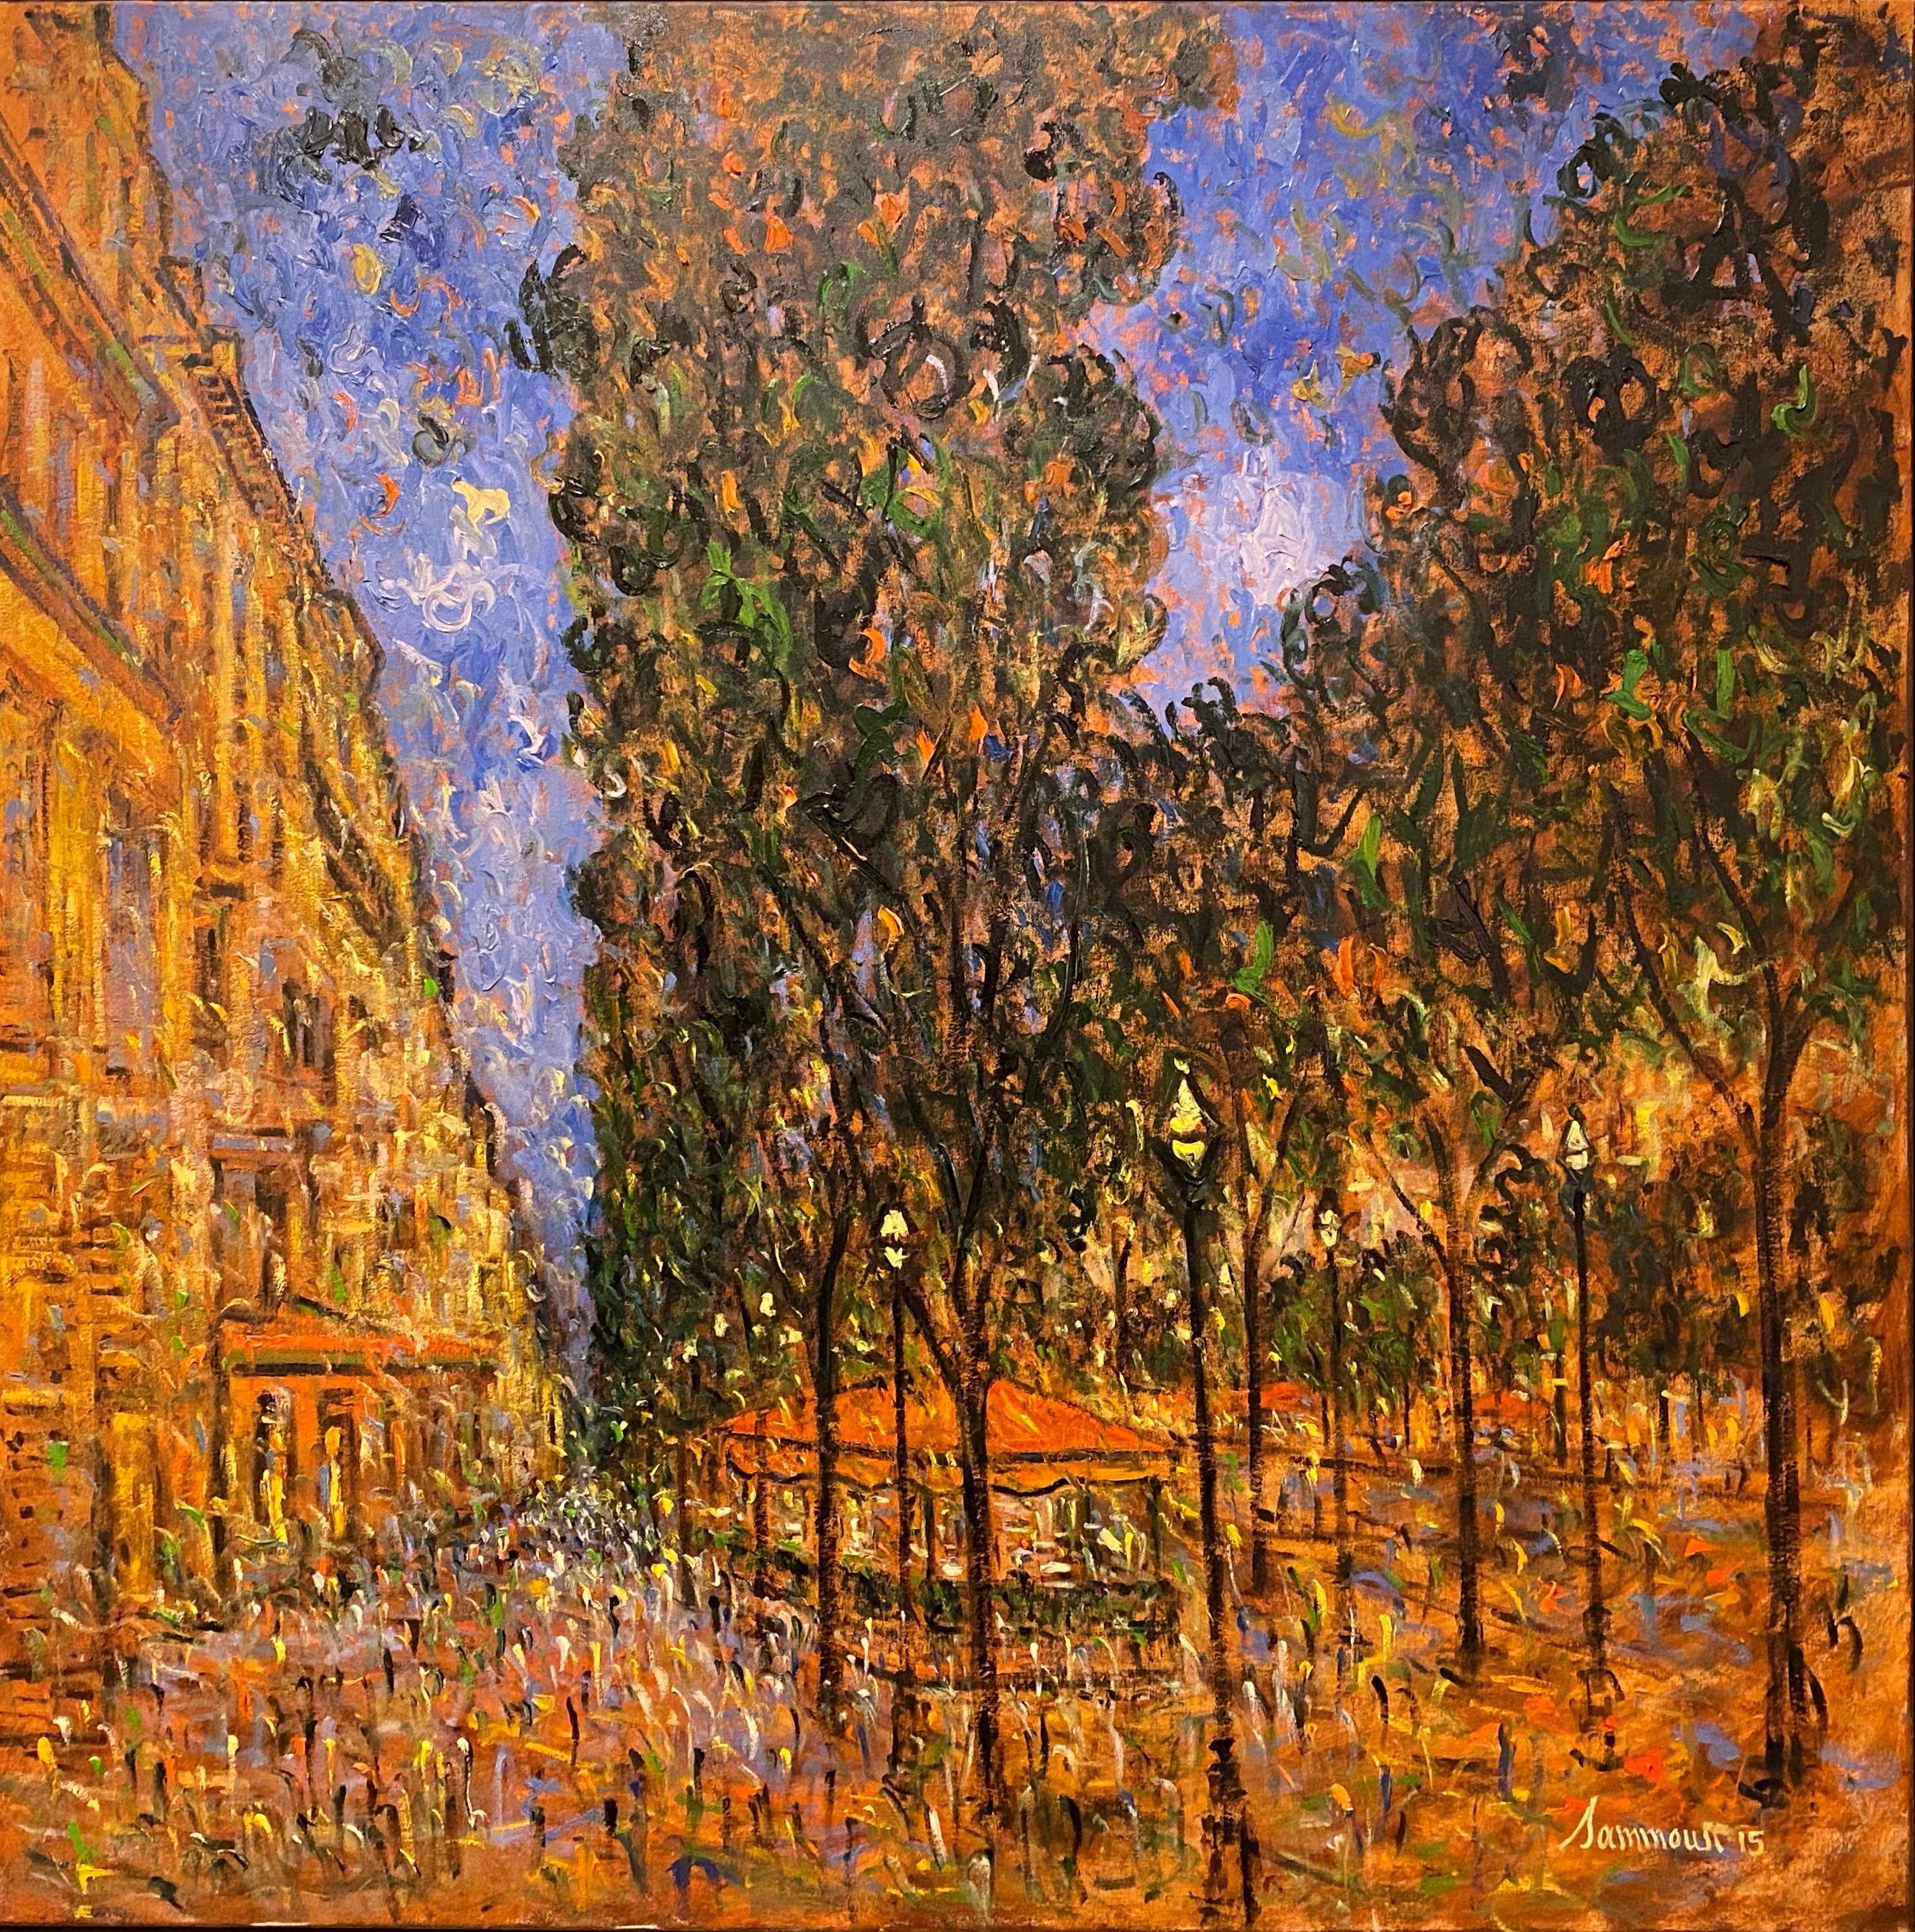 Samir Sammoun - Evening in Paris - Painting - Original oil on canvas - Off The Wall Gallery